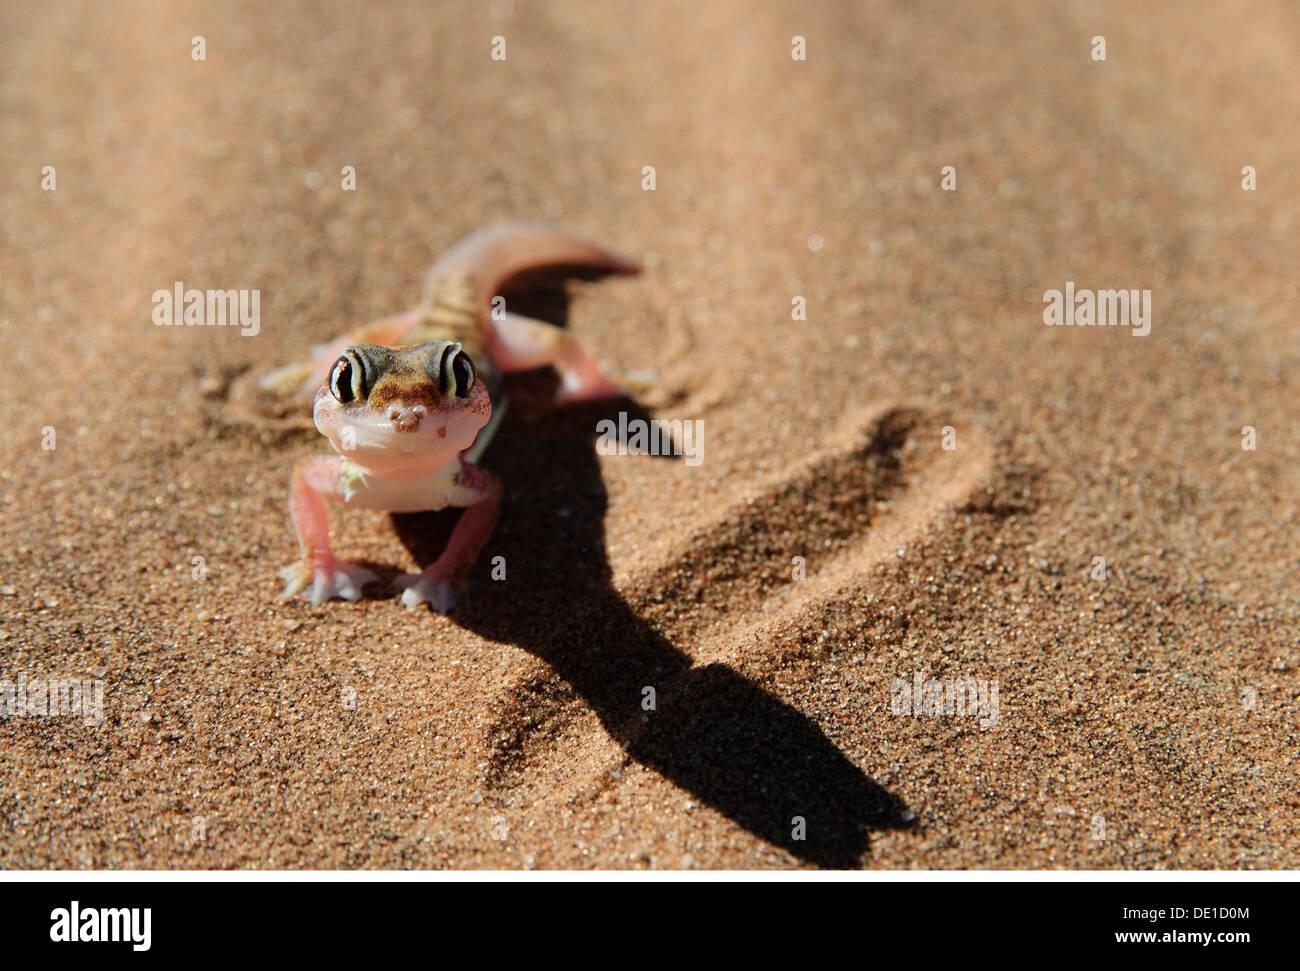 zoology / animals, reptiles, gecko, Web-footed gecko, (palmatogecko rangei), desert, Namib, Namibia, Africa, Additional Stock Photo